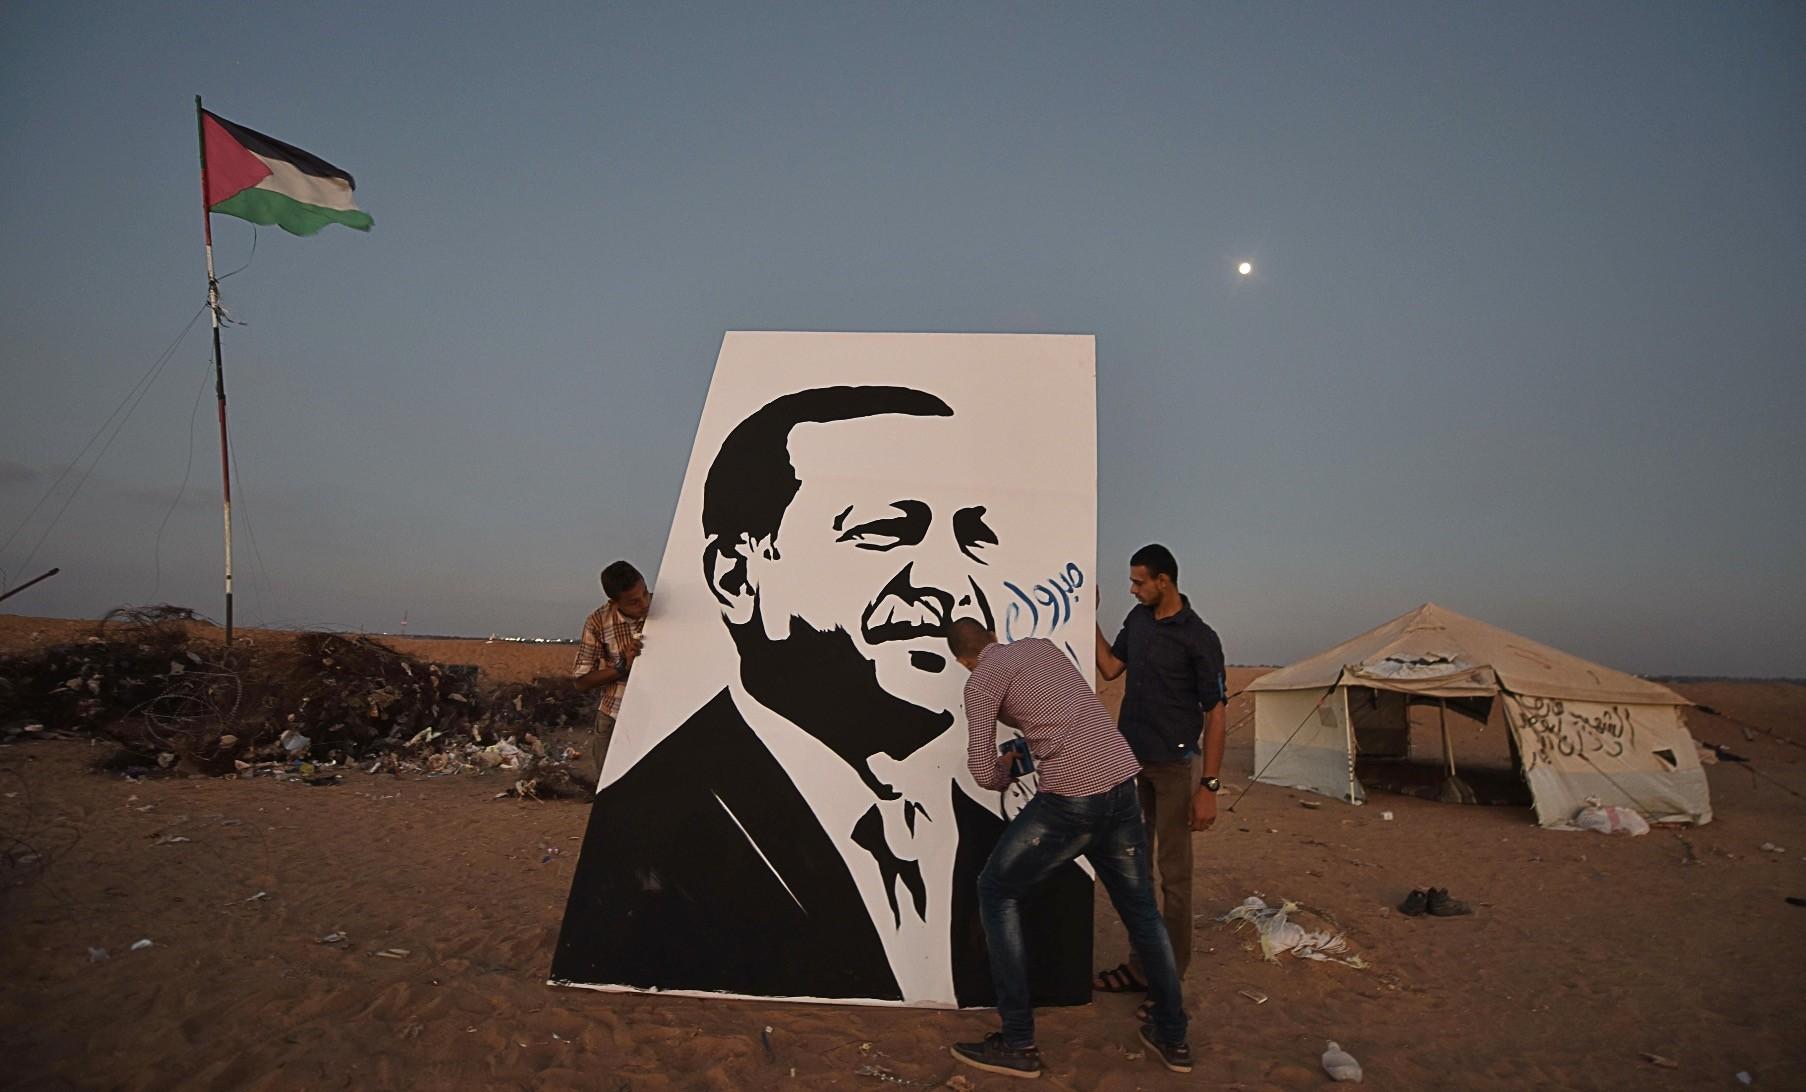 Beha al-Haribi, 21, draws Erdou011fanu2019s portrait in Khan Younis in the Gaza Strip.